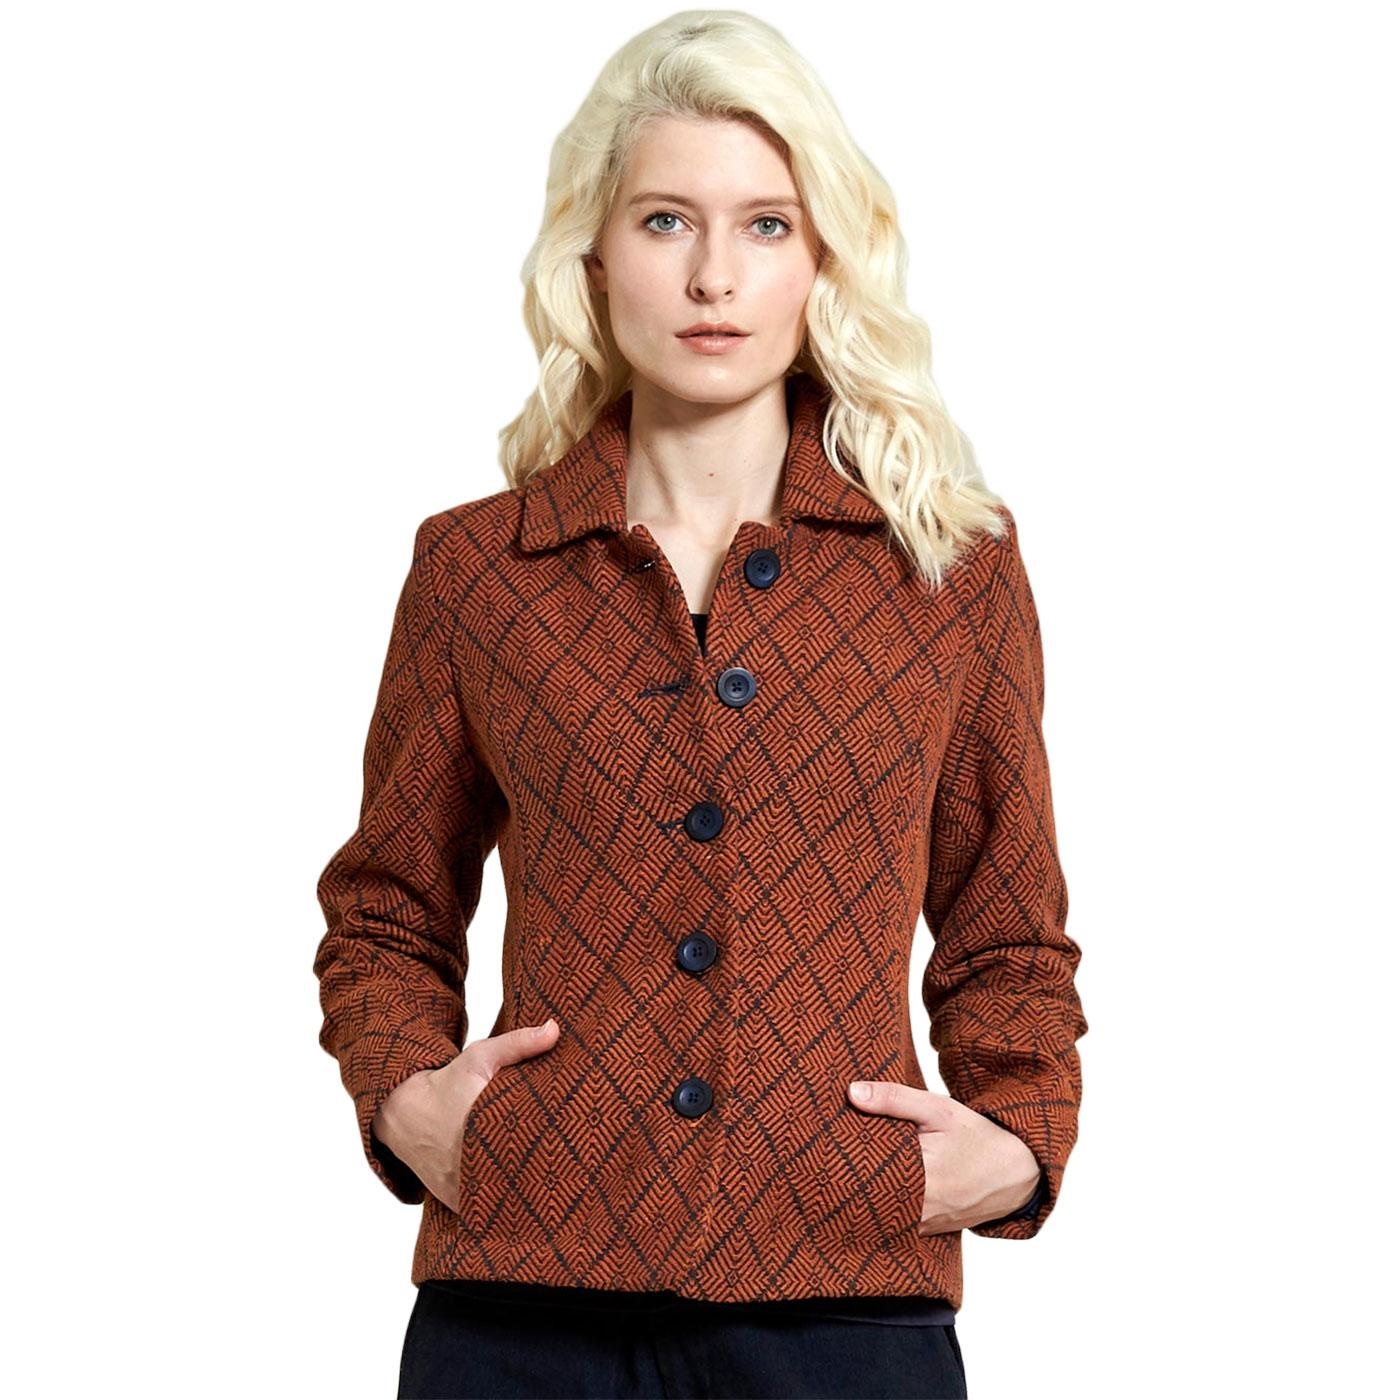 Handloom NOMADS Vintage Short Jacket In Sienna